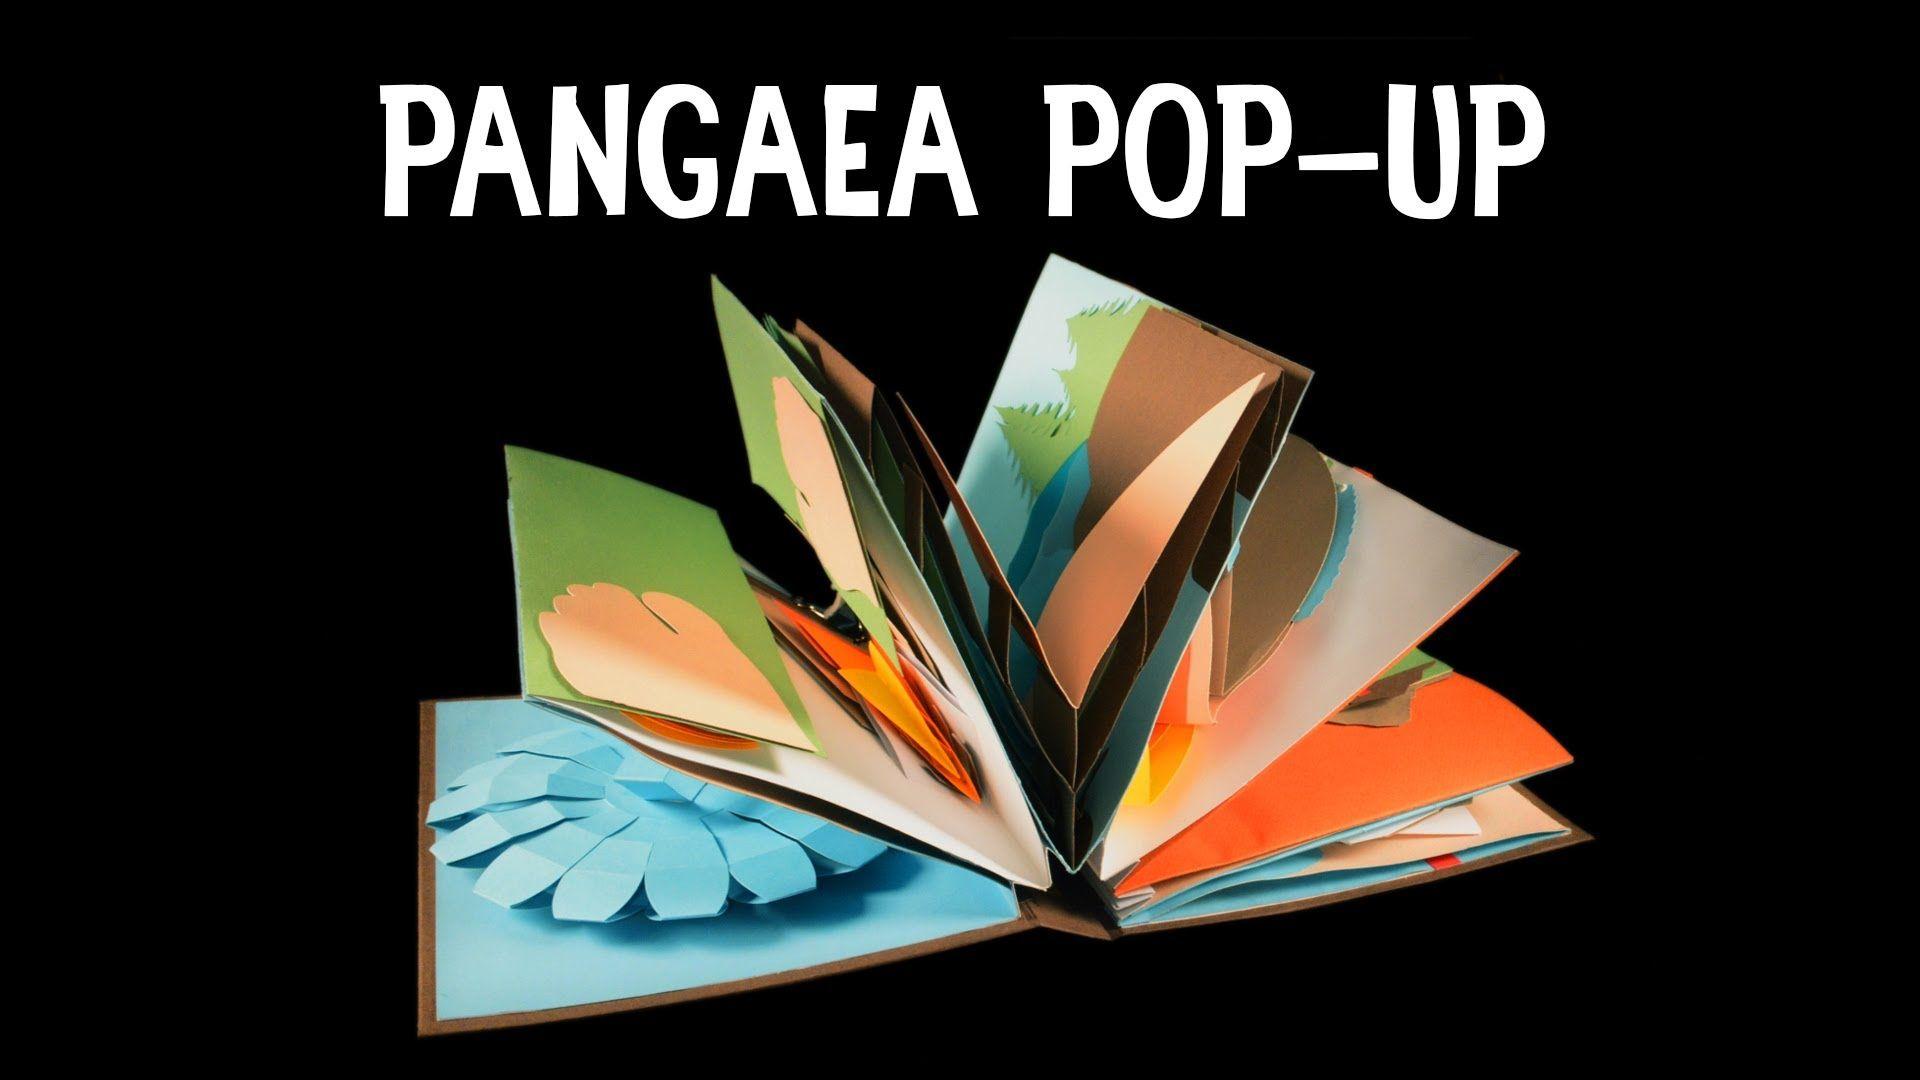 The Pangaea Pop Up